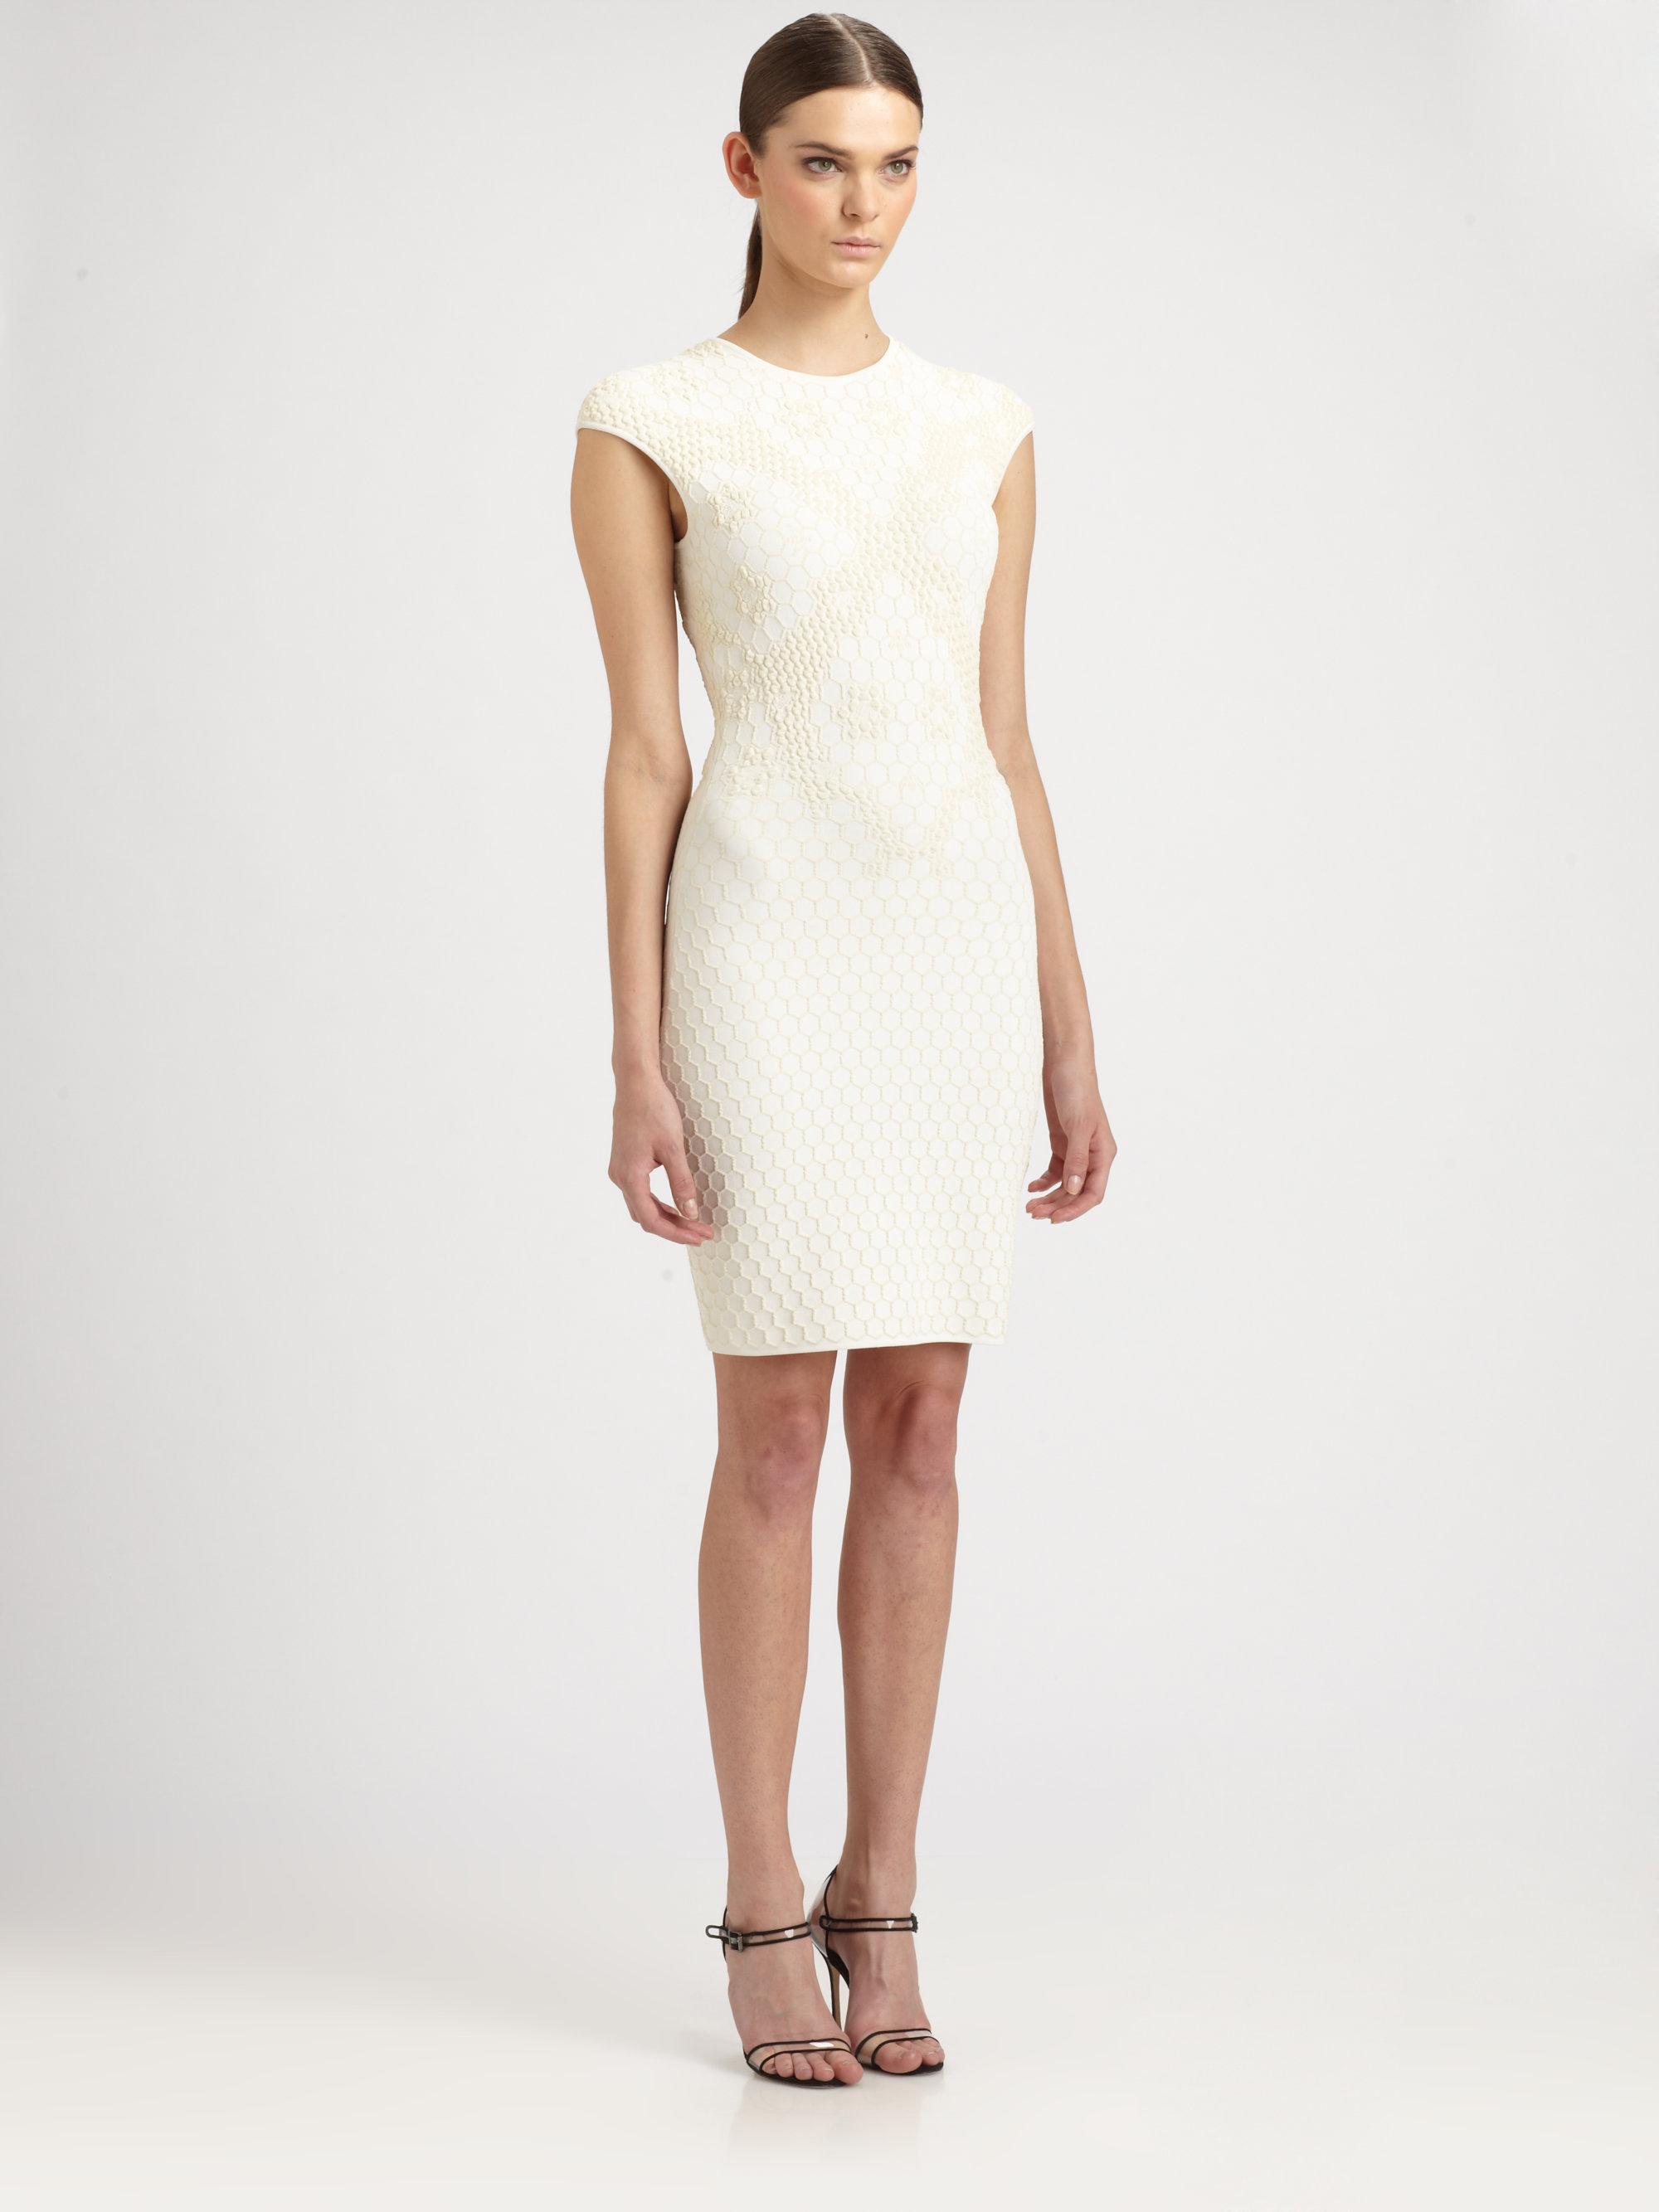 Lyst - Alexander Mcqueen Honeycomb Mini Dress in White